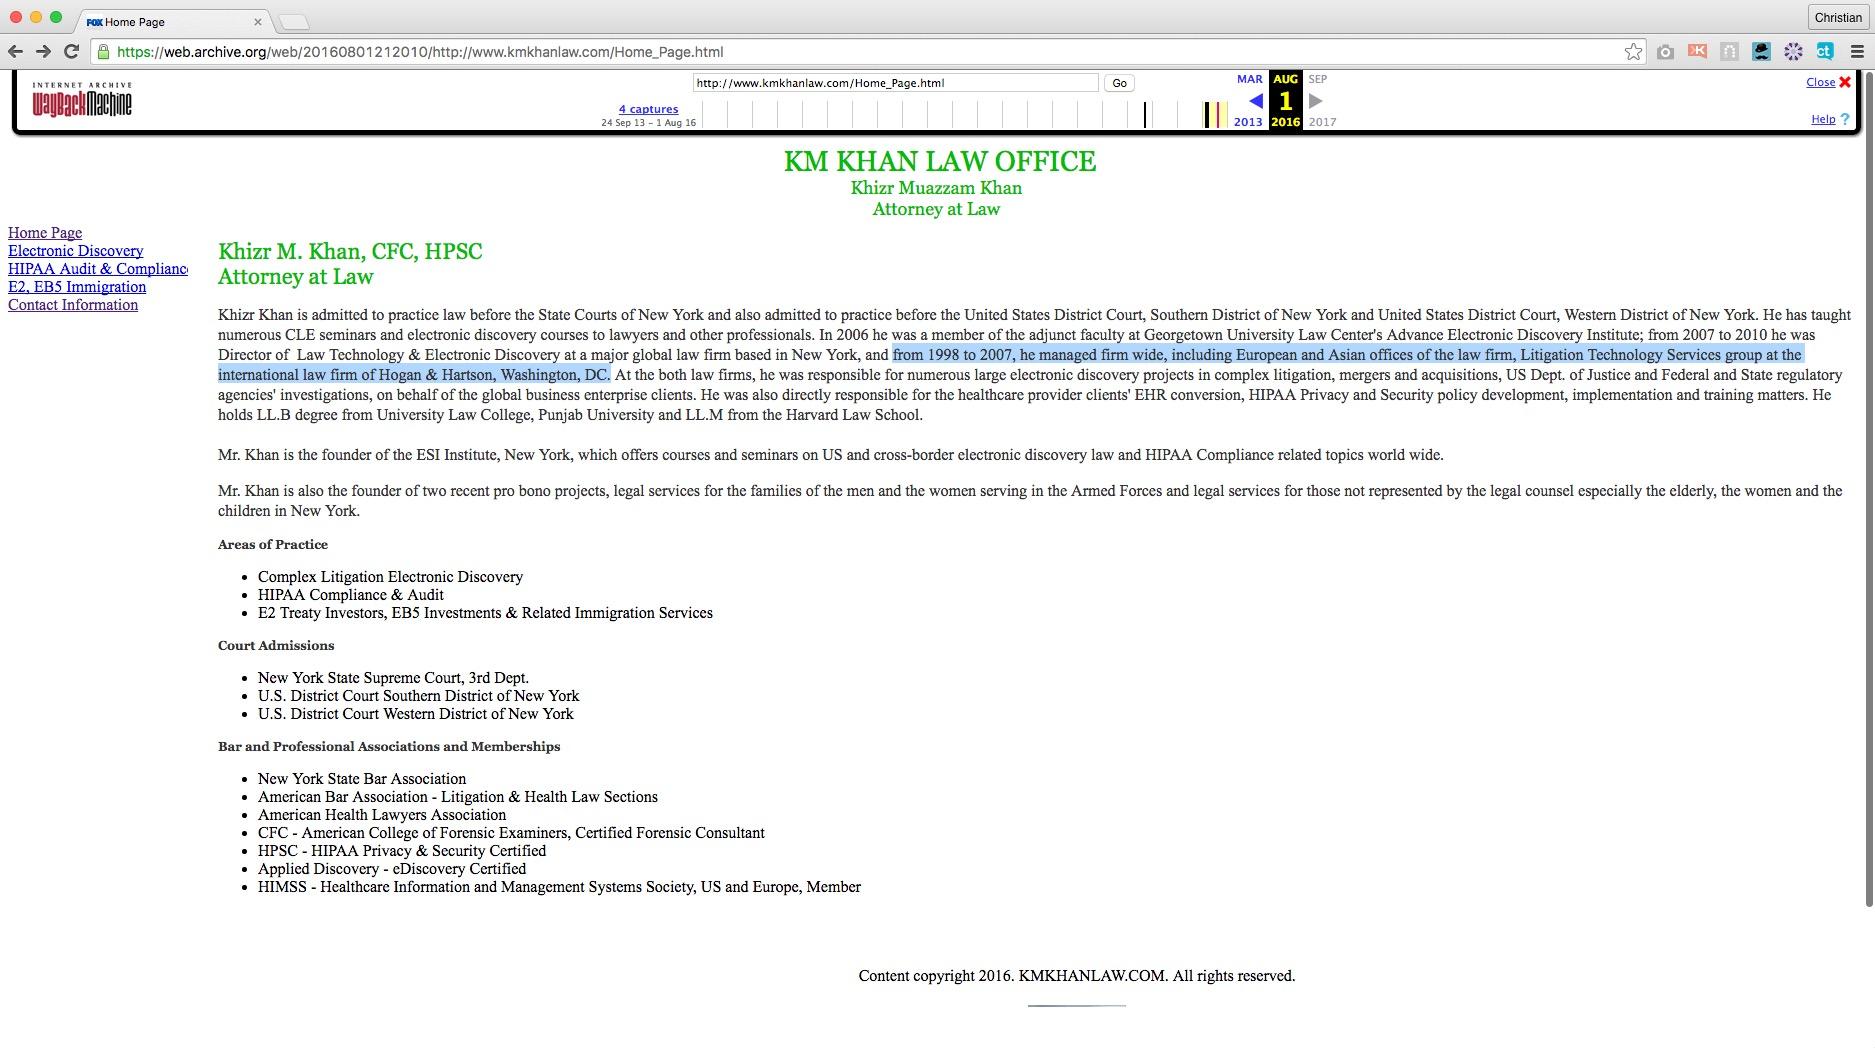 (screenshot: KM Kahn Law Office website via The Way Back Machine)